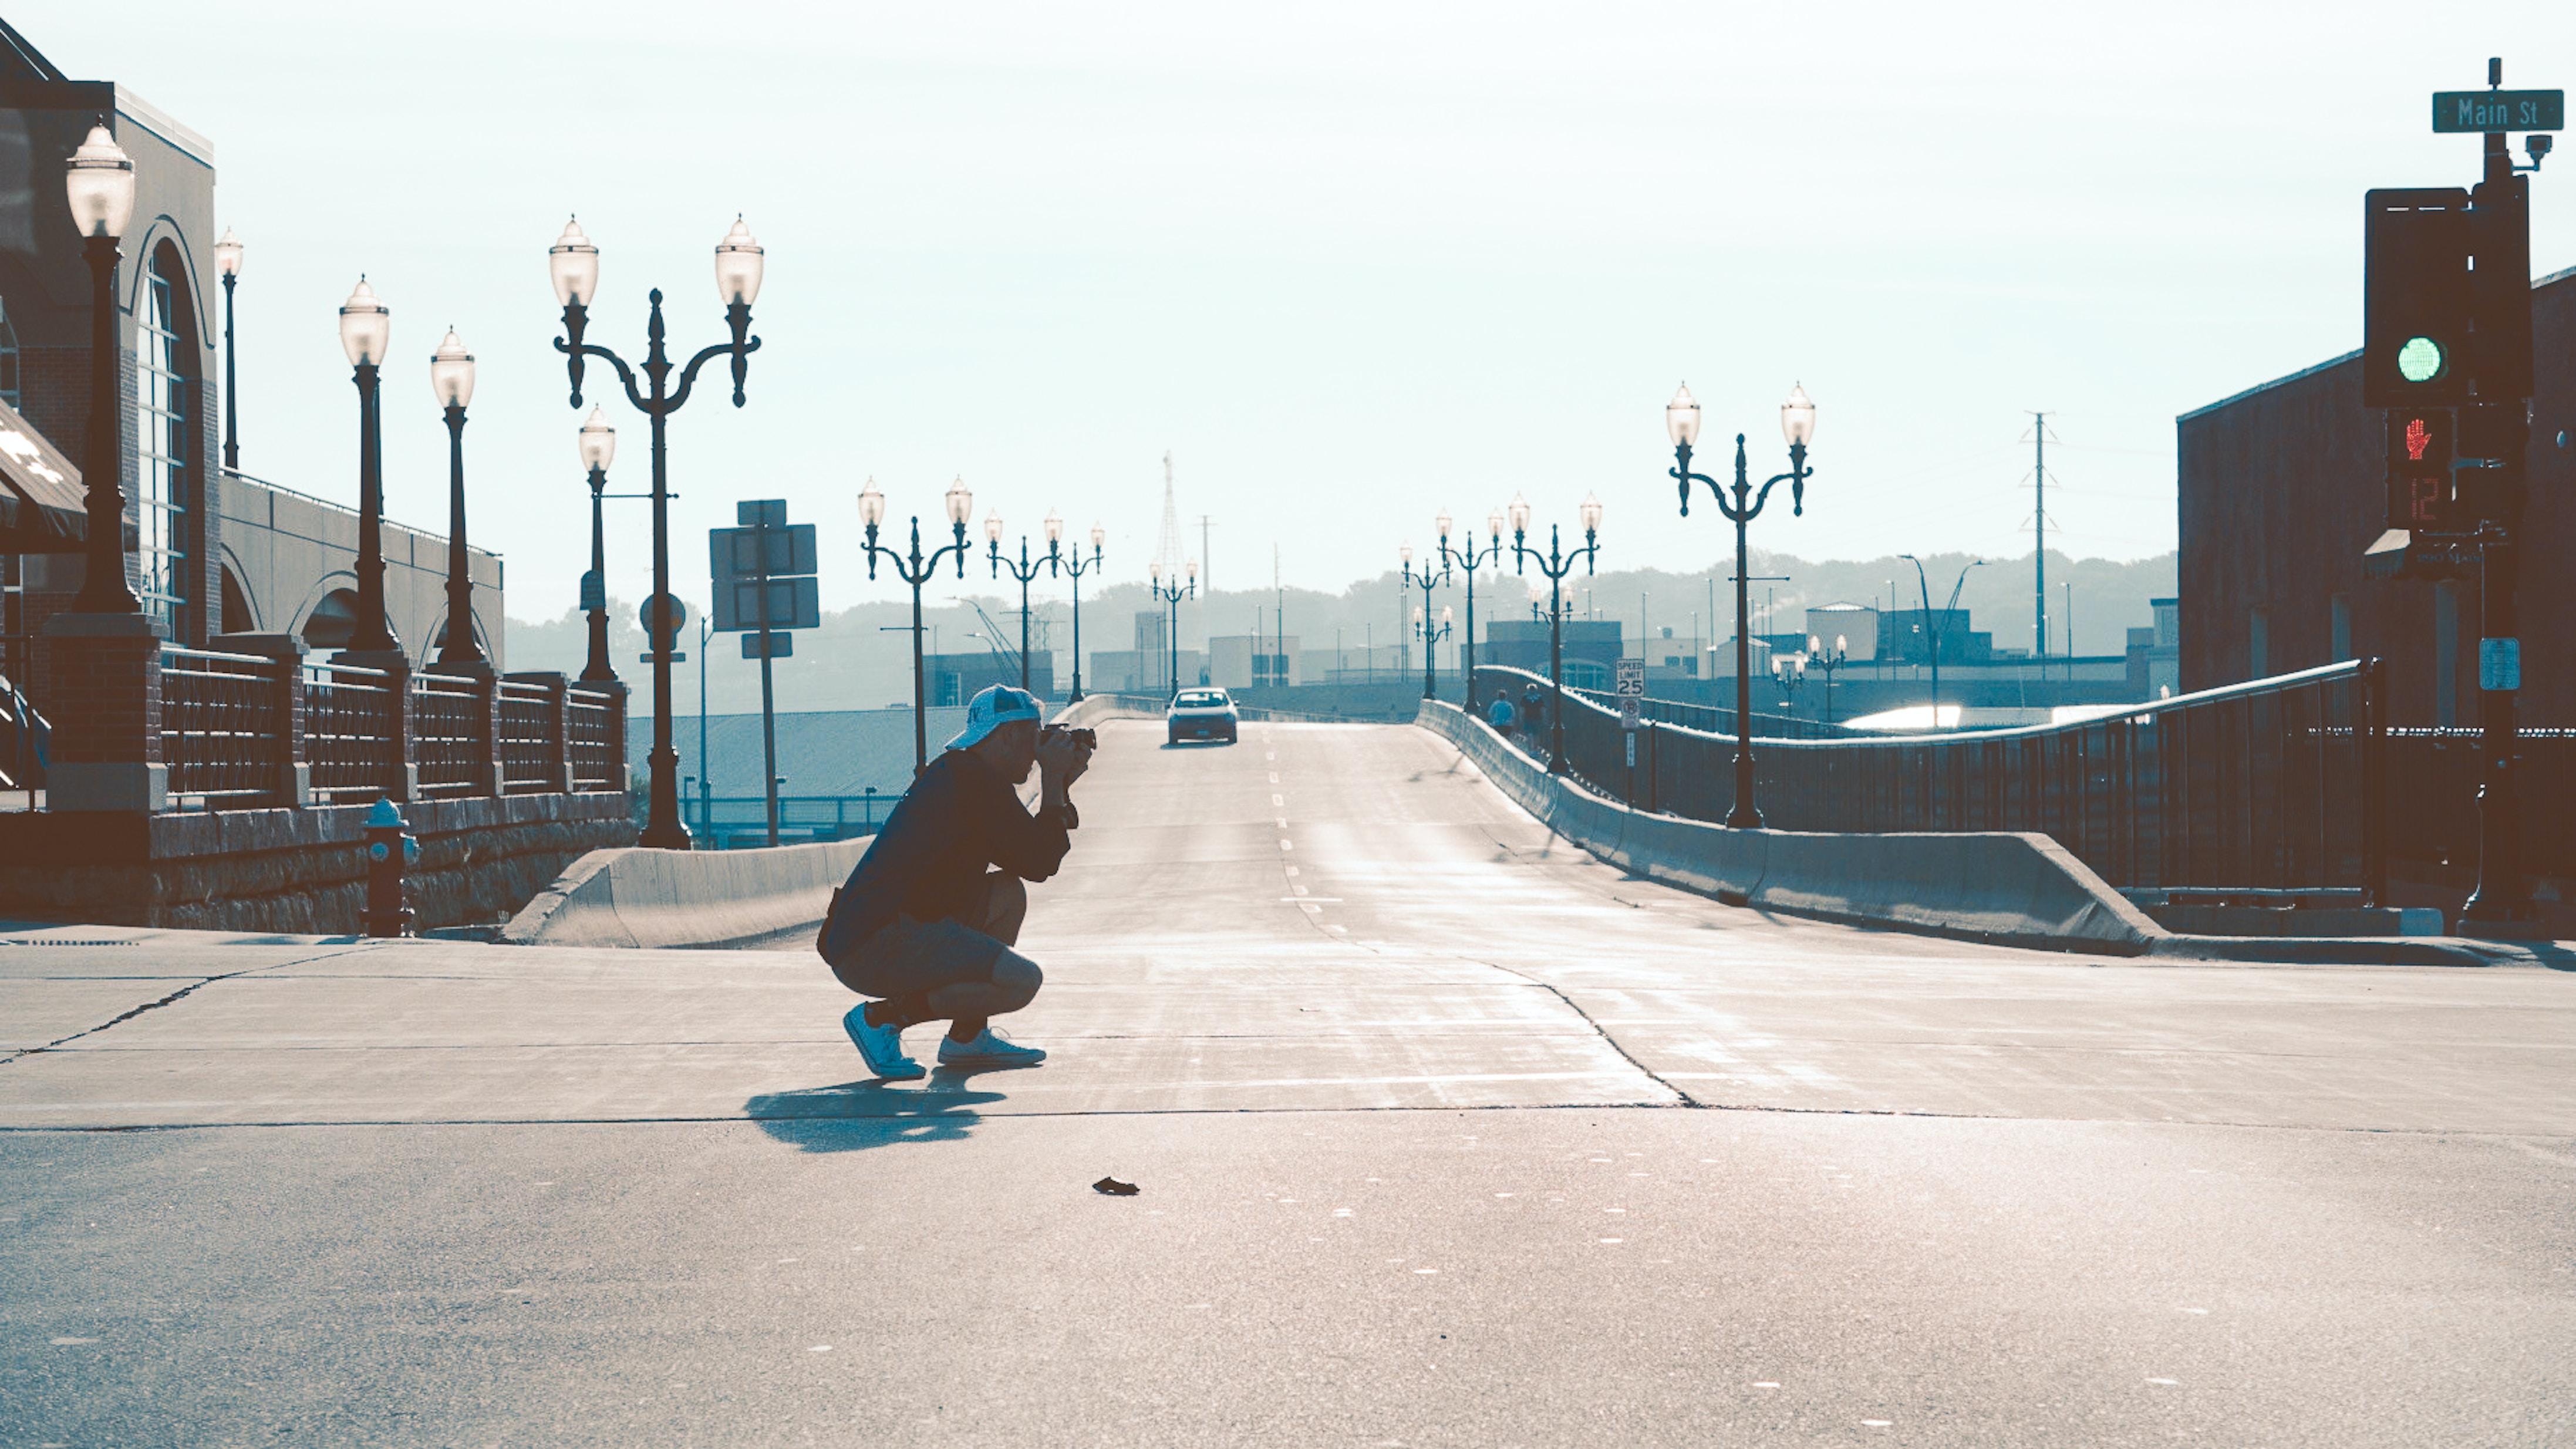 man squatting on road while taking photo